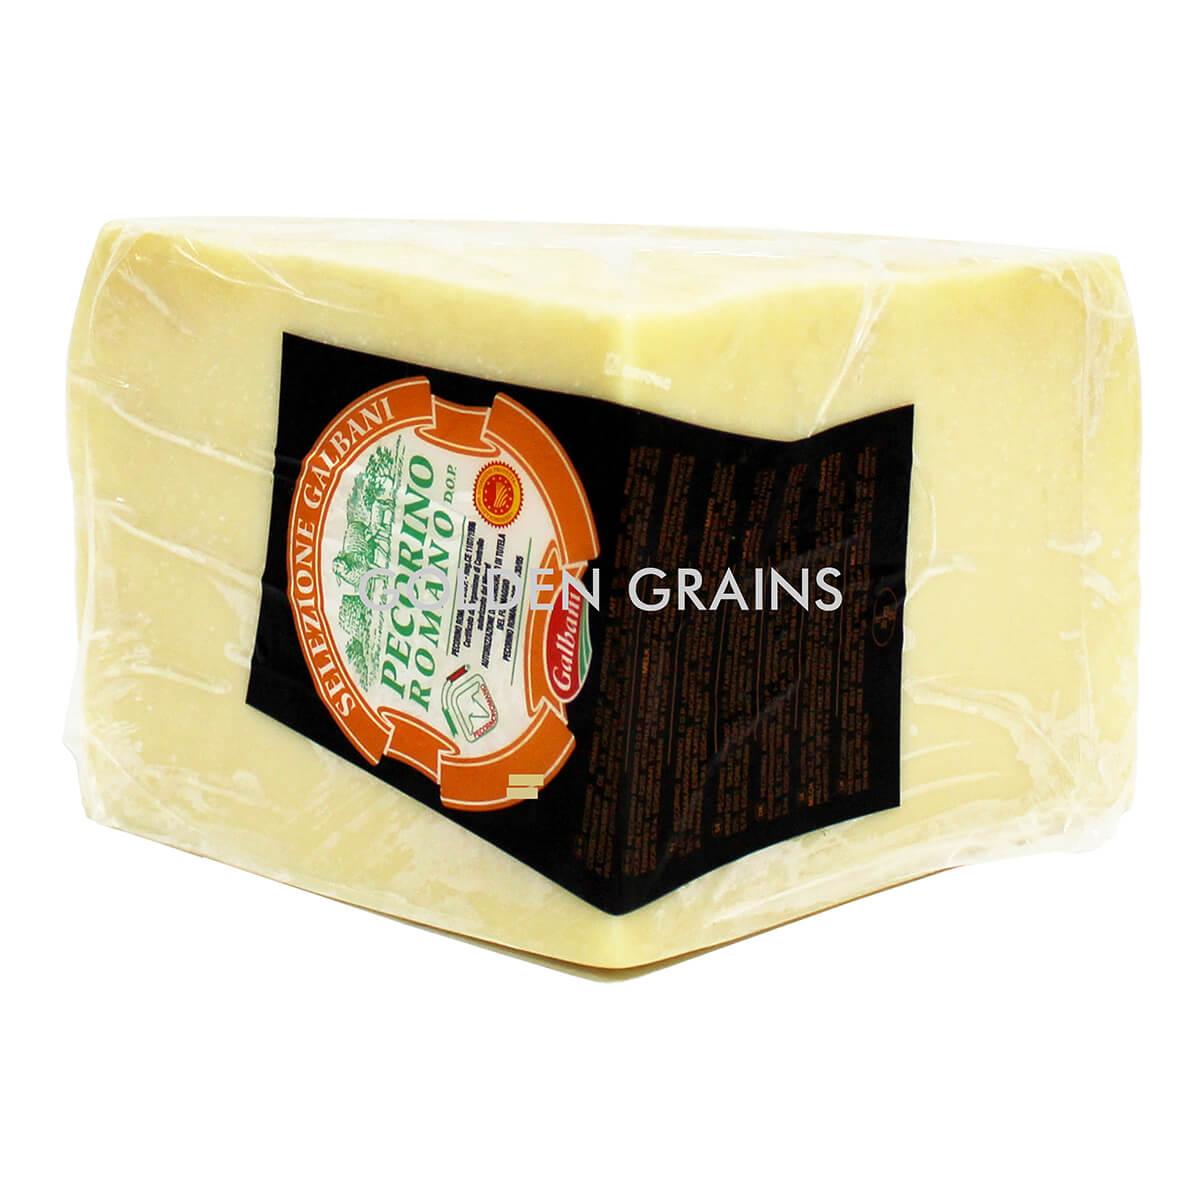 Golden Grains Dubai Export - Pecorino Romano - Other Side.jpg